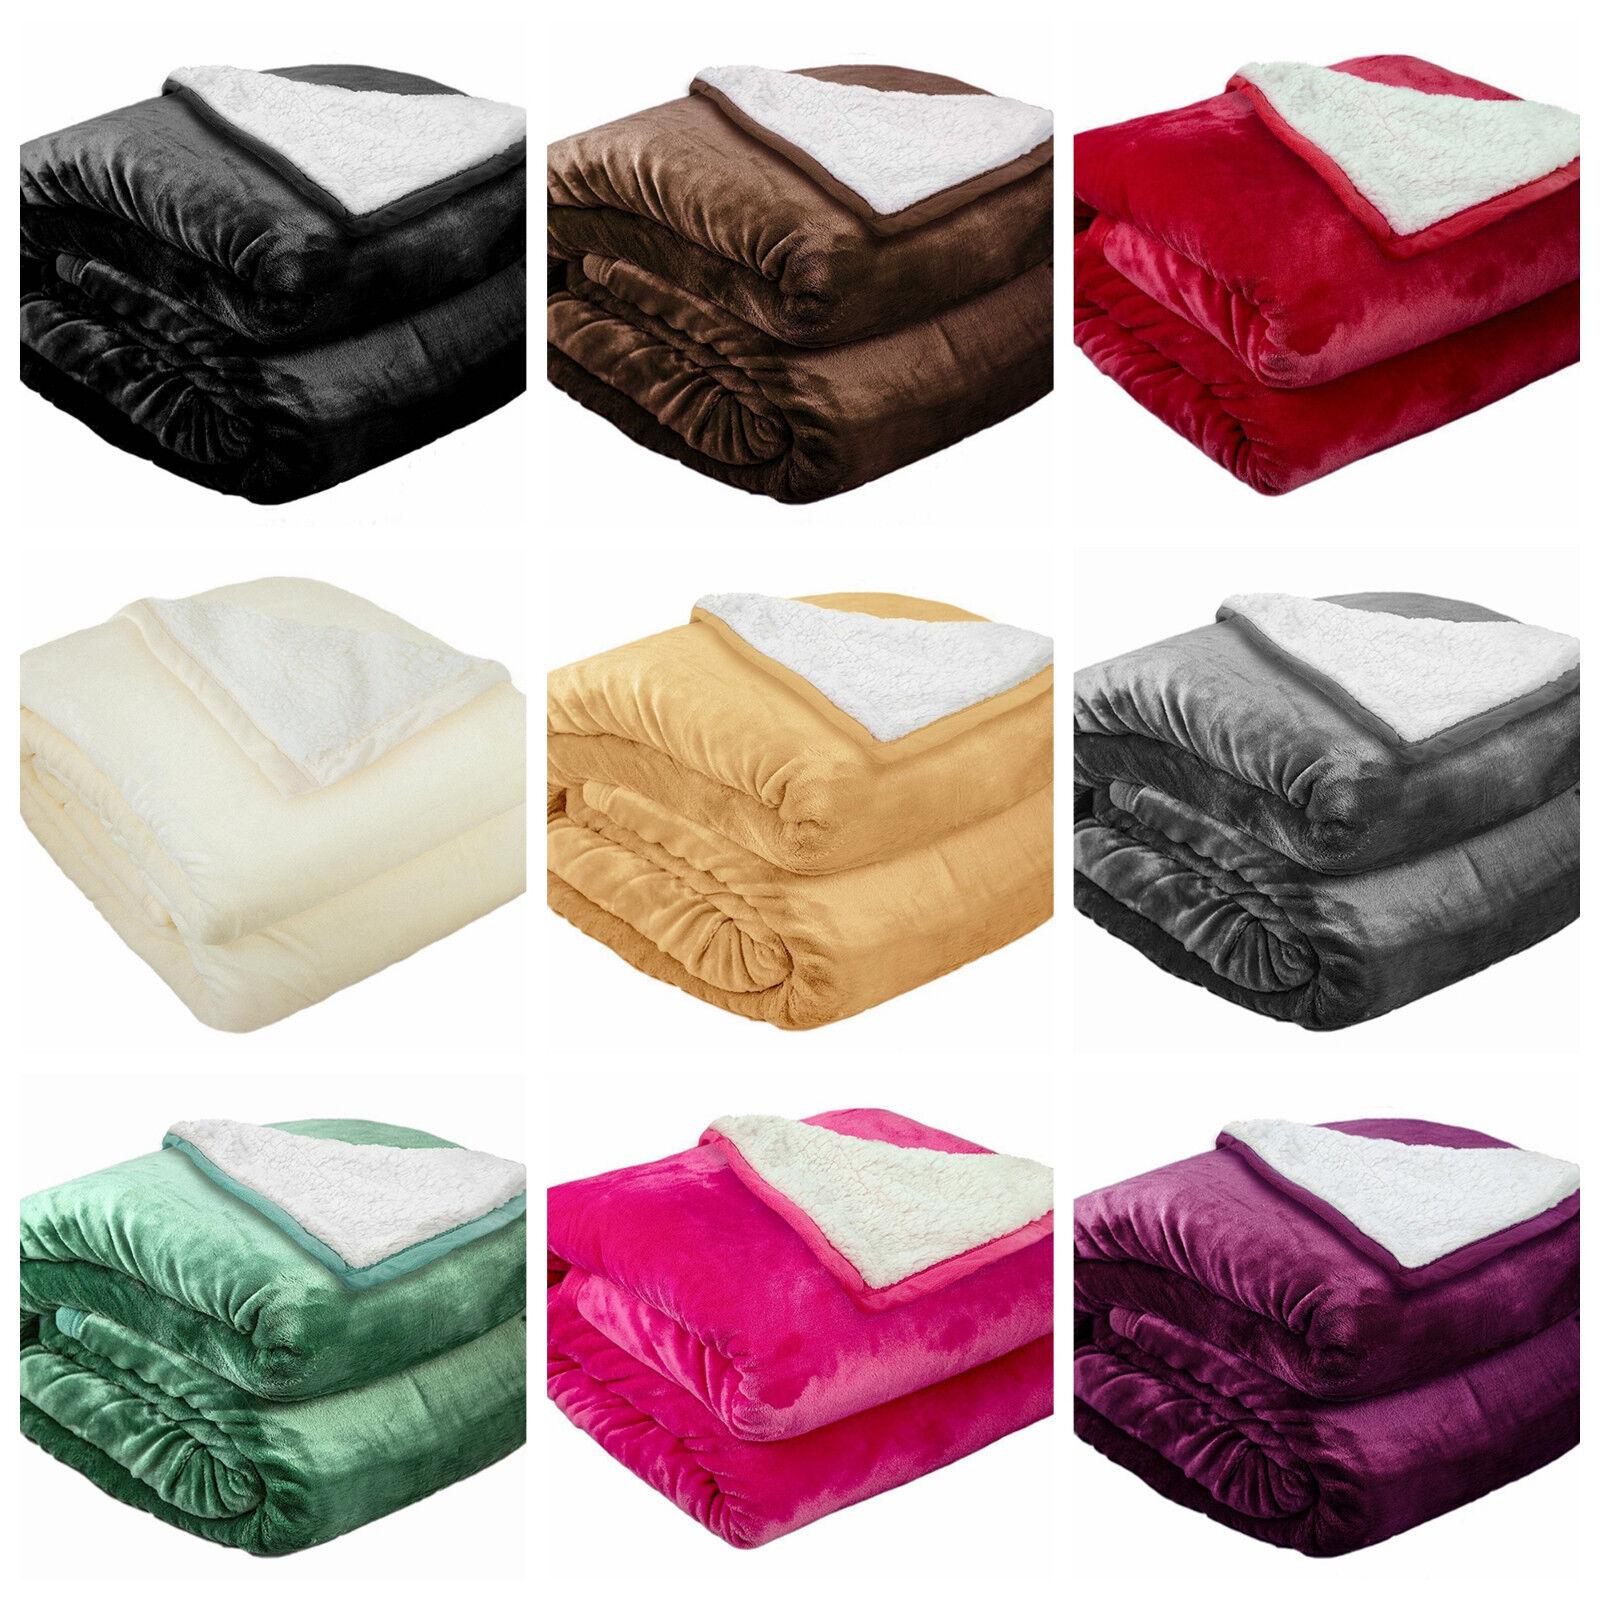 MarCielo Sherpa Throw Blanket Microfiber Velvet Soft Borrego